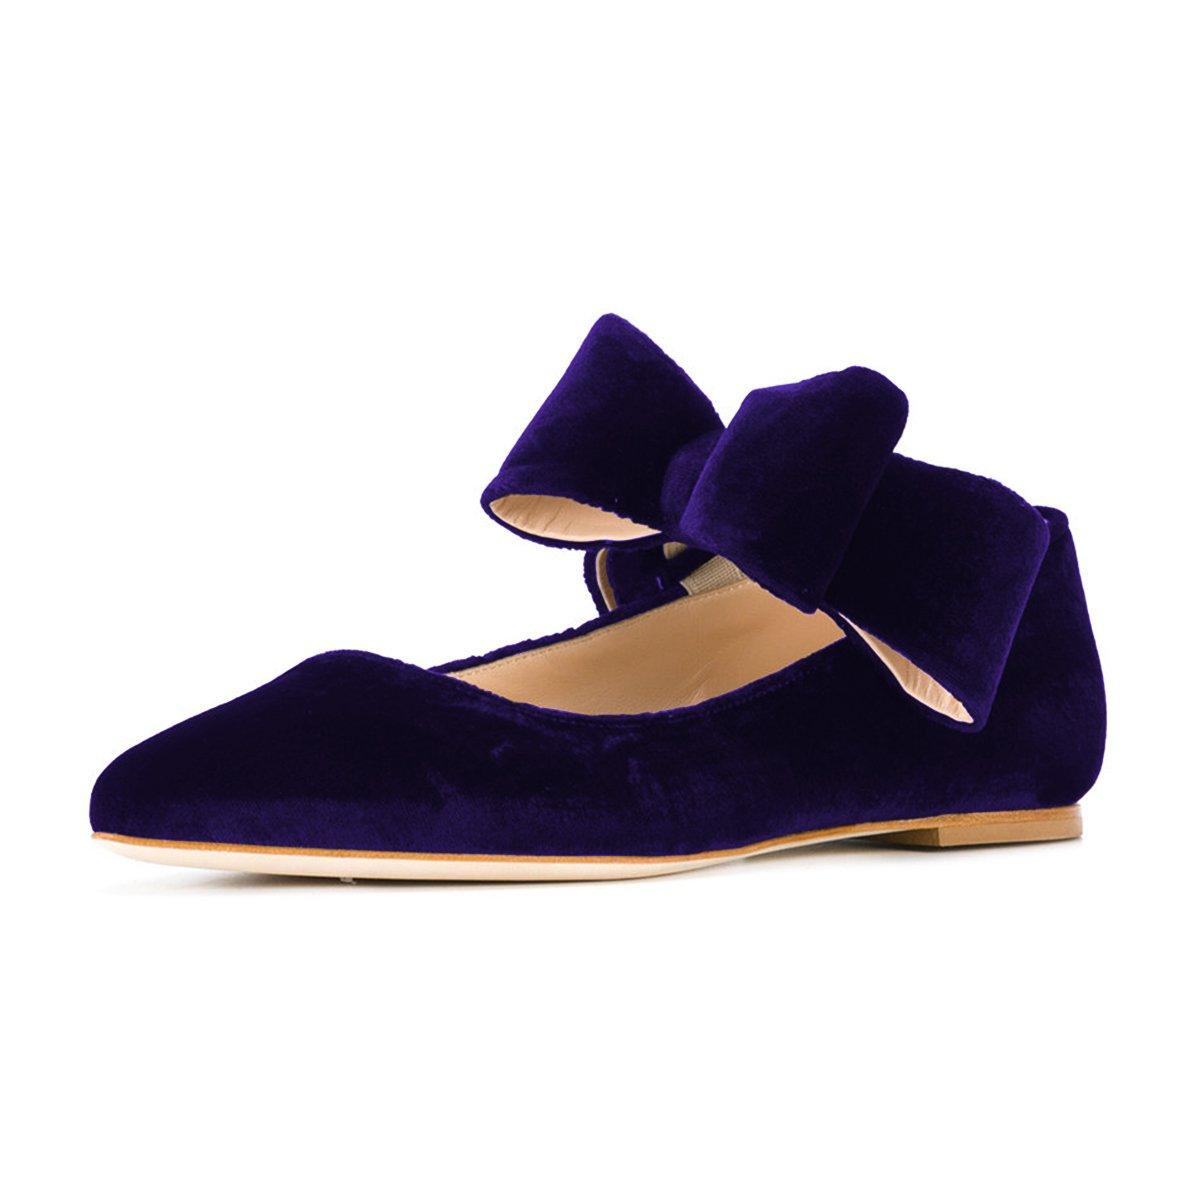 FSJ Women Cute Pointed Toe Flats With Bowknot Velvet Low Heels Slip On Comfy Shoes Size 4-15 US B076Q9197G 11 B(M) US|Purple